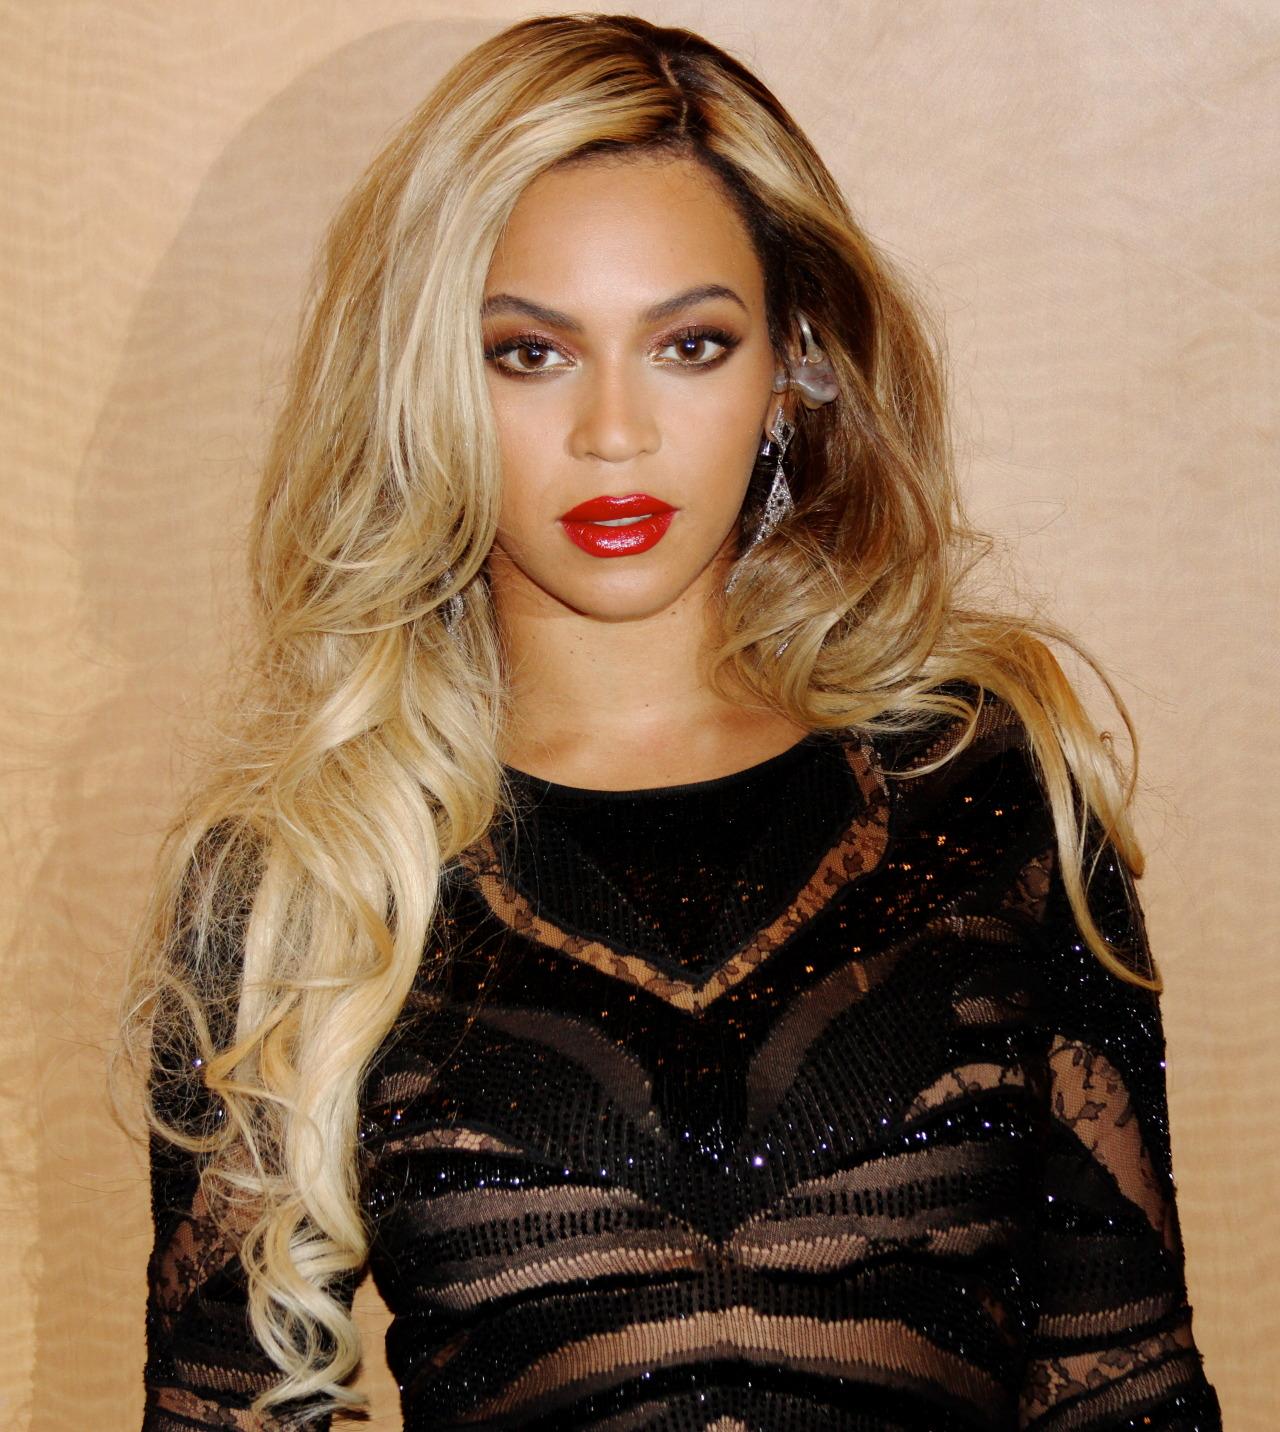 Beyoncé - Twitter (@Beyonce), Instagram (Baddiebey), Tumblr (I Am...) [II] - Página 2 Tumblr_n0i2rd8F5p1rqgjz2o1_1280